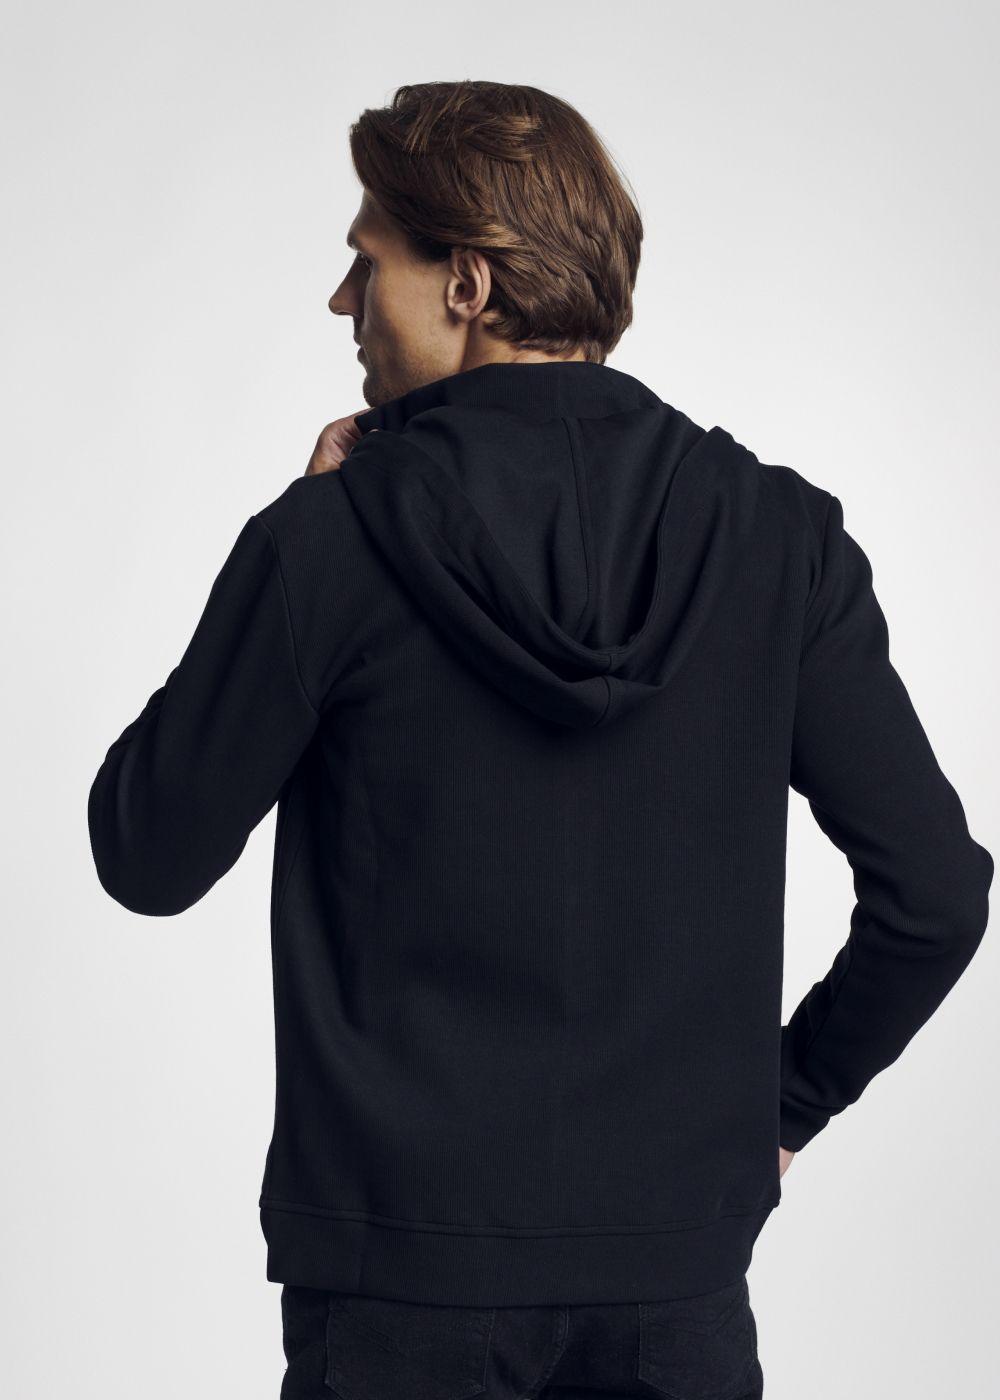 Bluza męska BLZMT-0022-99(Z21)